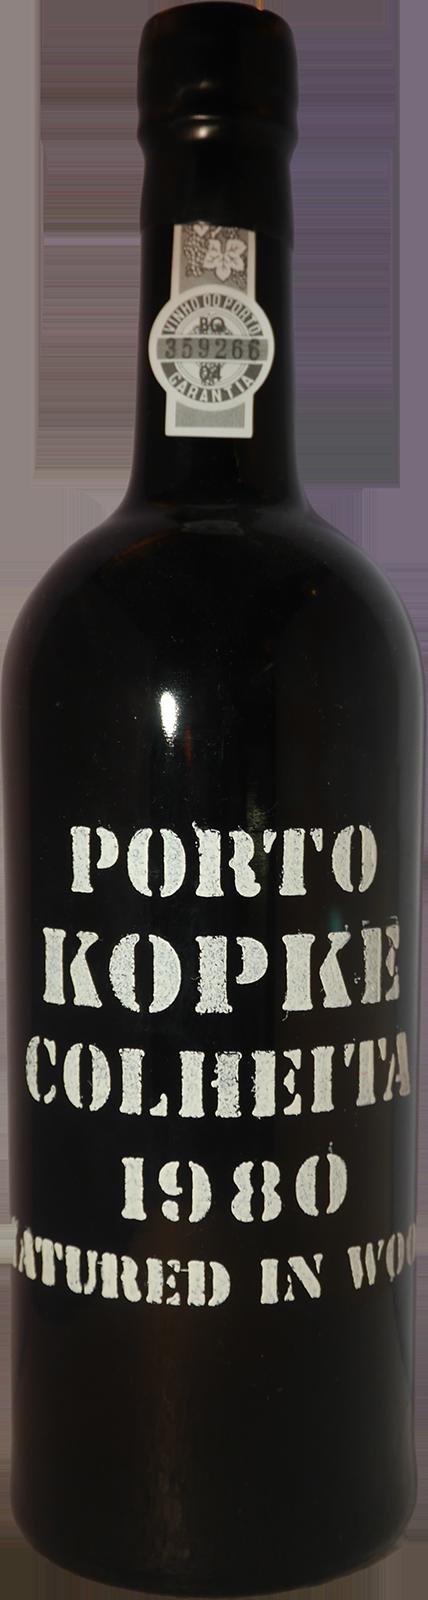 1980-Kopke Colheita Port